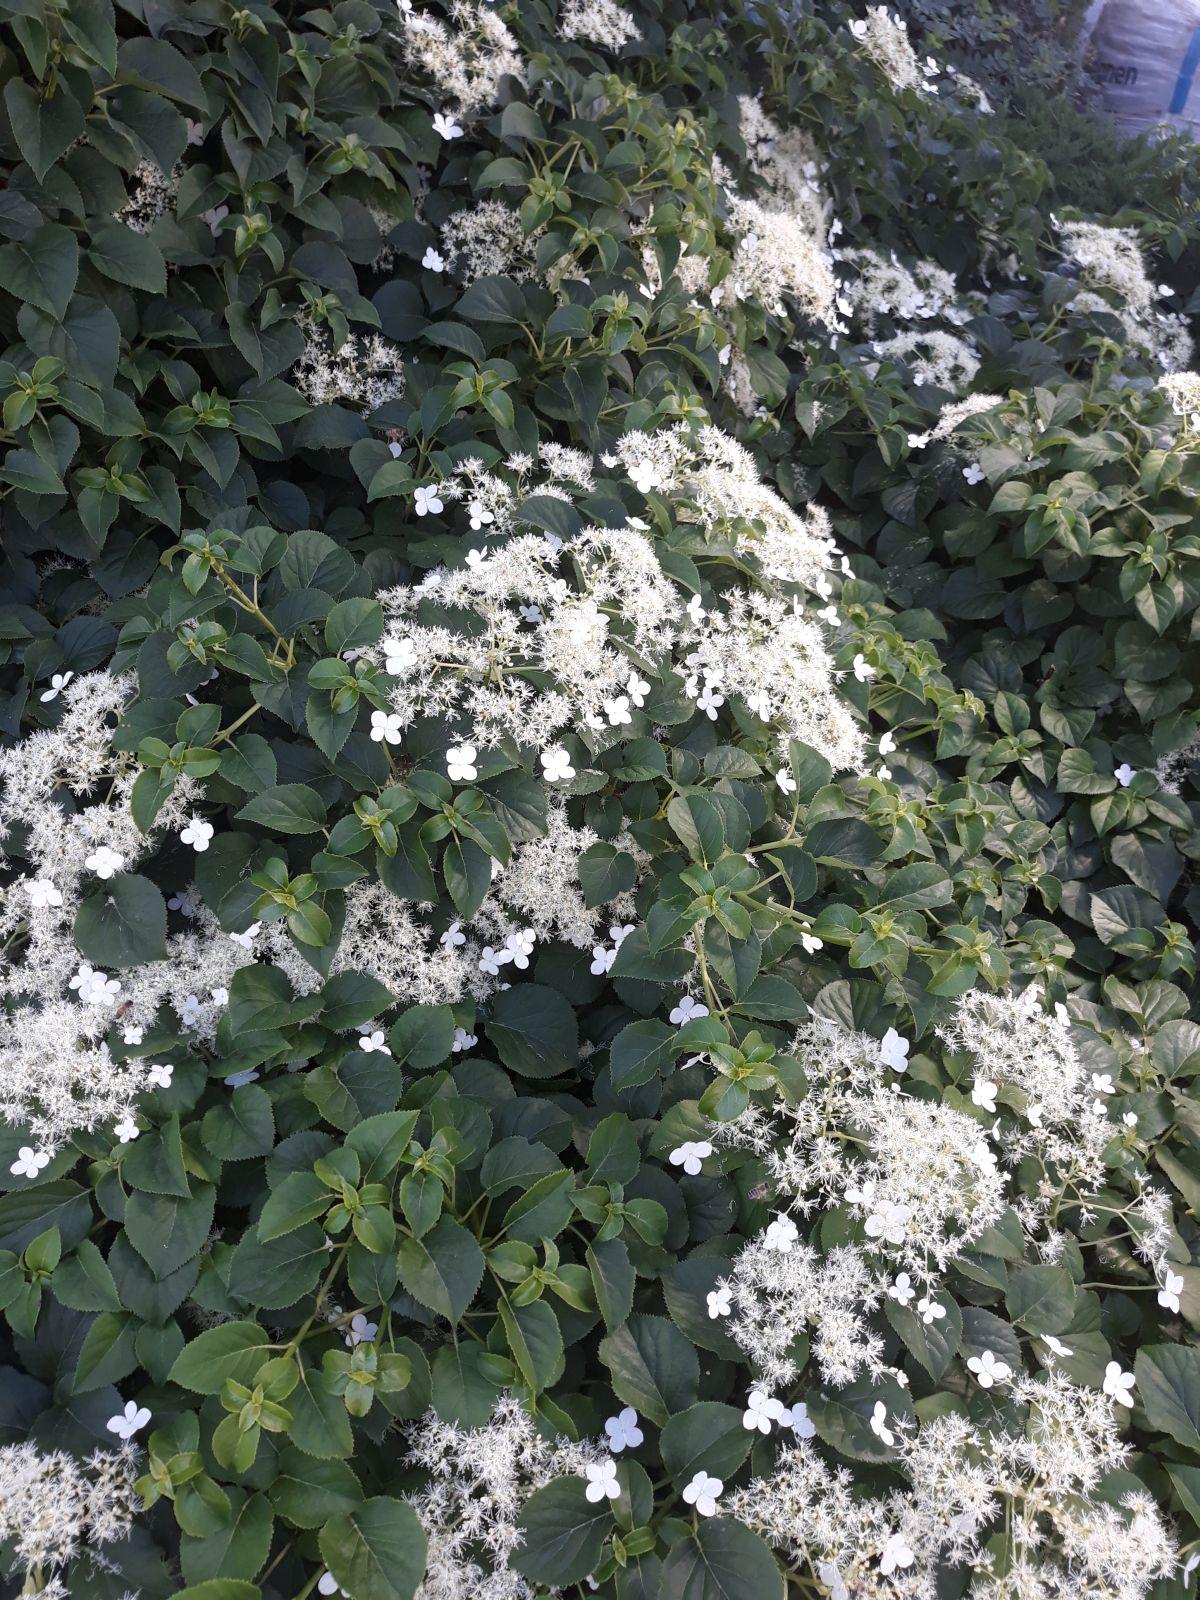 Hortensja Pnąca (Hydrangea Anomala Subs. Petiolaris)